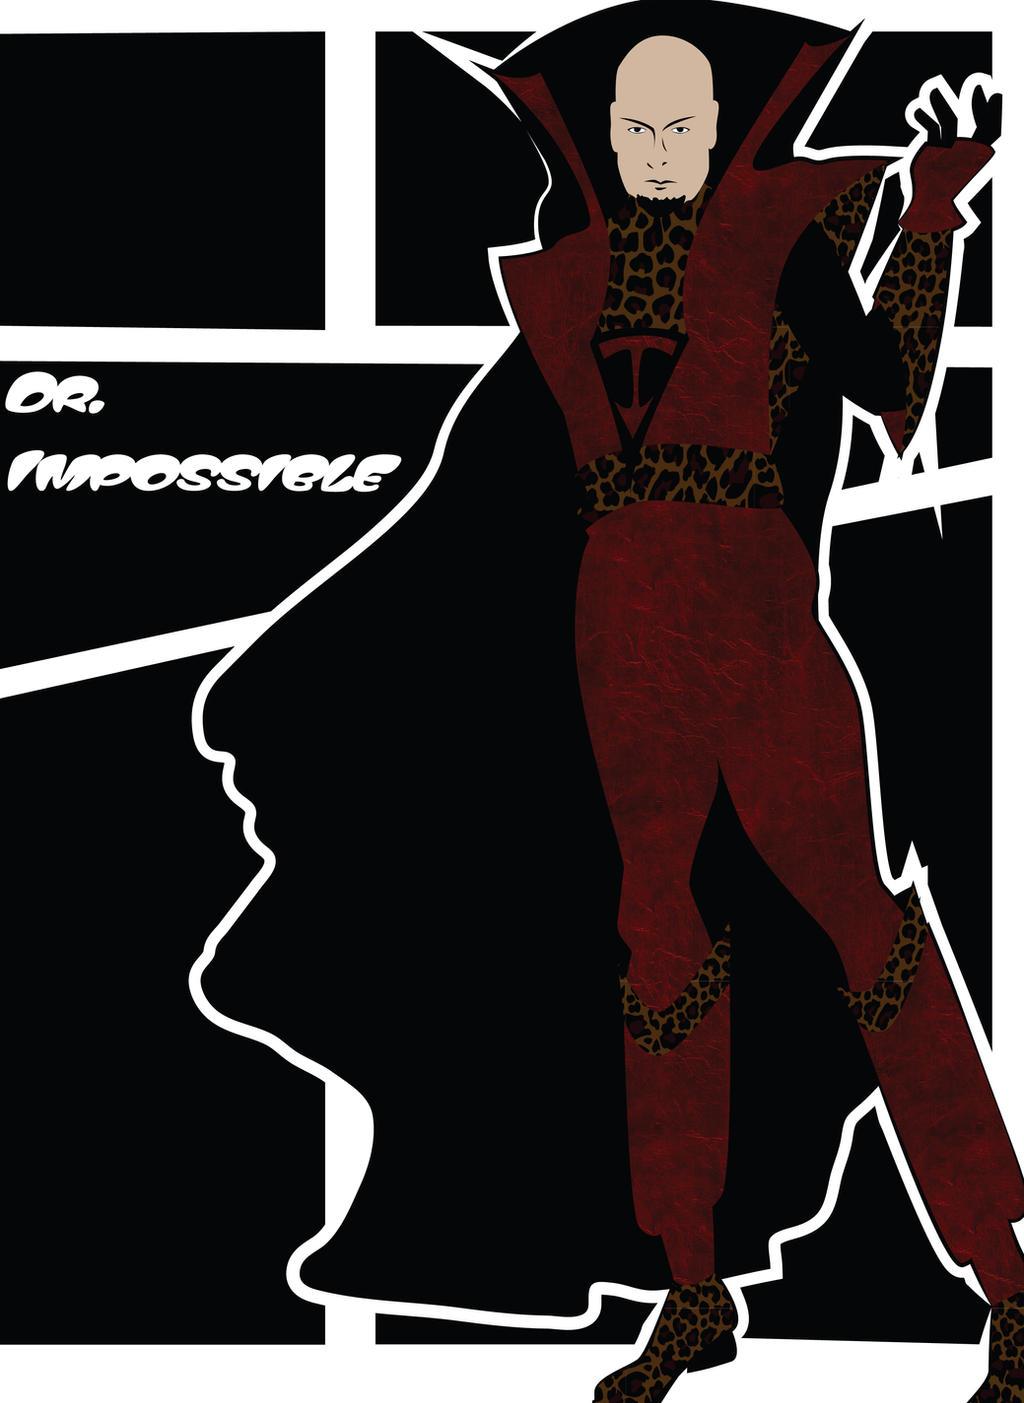 Costume Design: Soon I Will Be Invincible: Dr. I by phantomonex